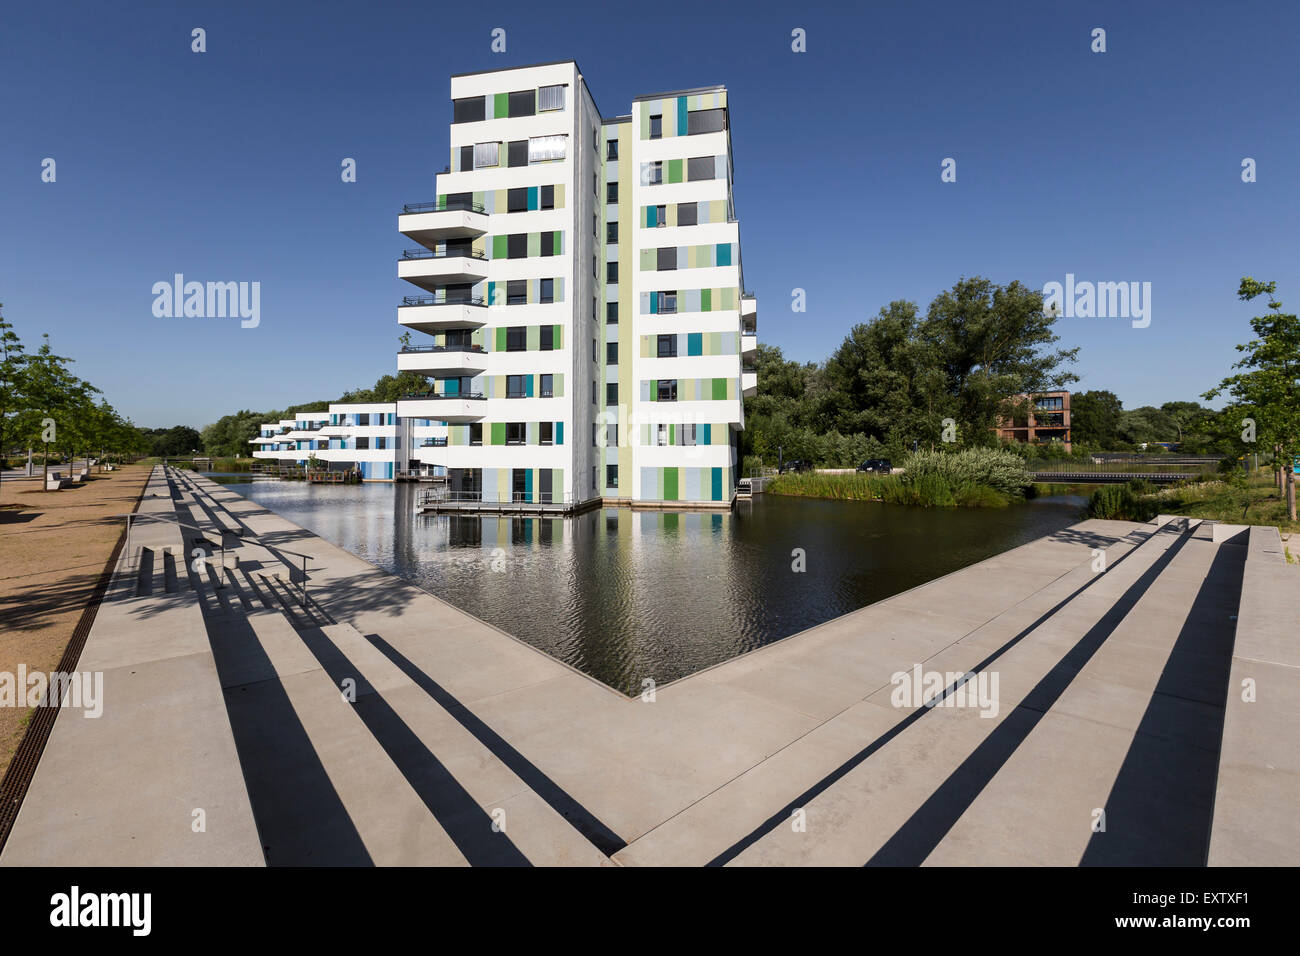 Modernos edificios de apartamentos en Hamburgo en medio de un agua Imagen De Stock